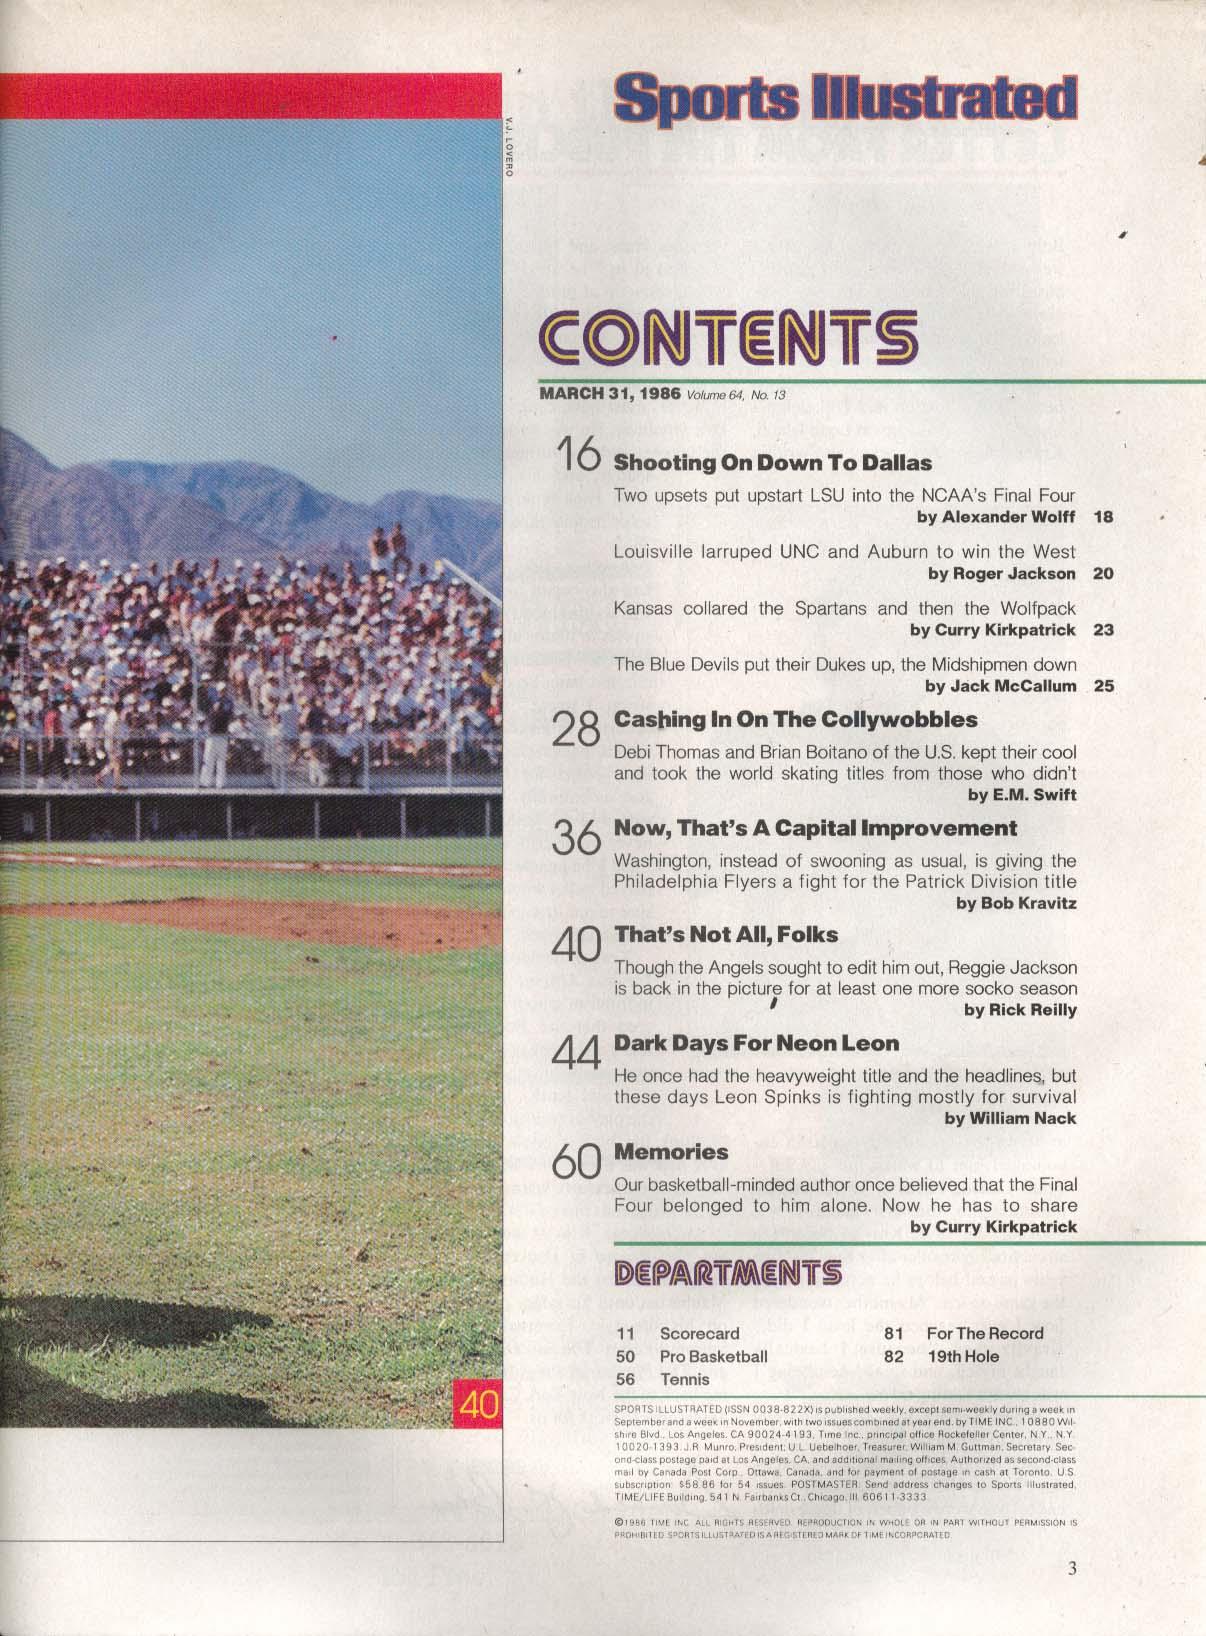 SPORTS ILLUSTRATED Brian Boitano Debi Thomas Reggie Jackson 3/31 1986